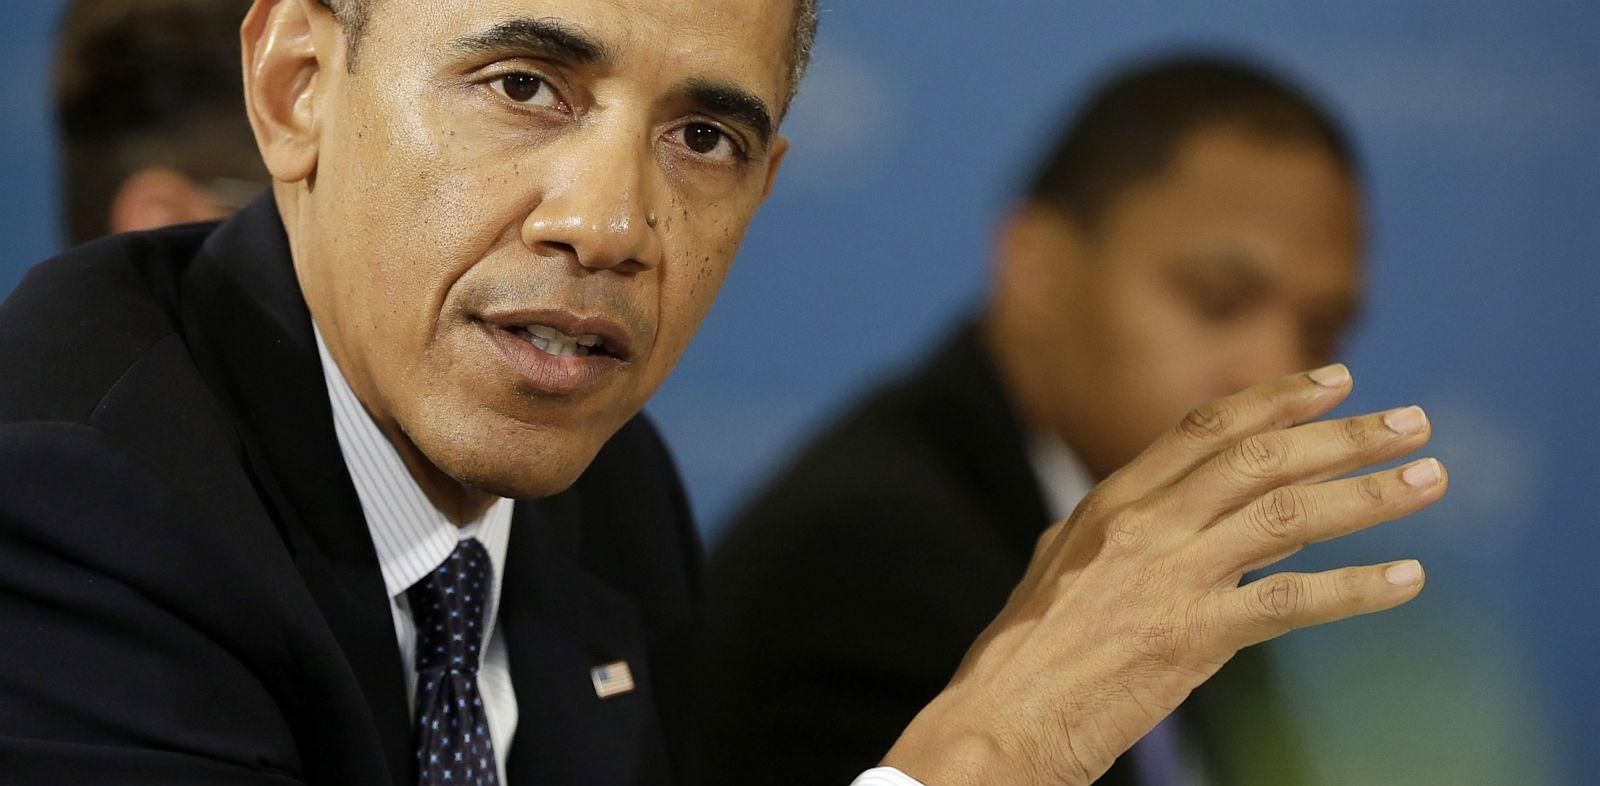 PHOTO: President Barack Obama speaks in St. Petersburg, Russia, Sept. 6, 2013.